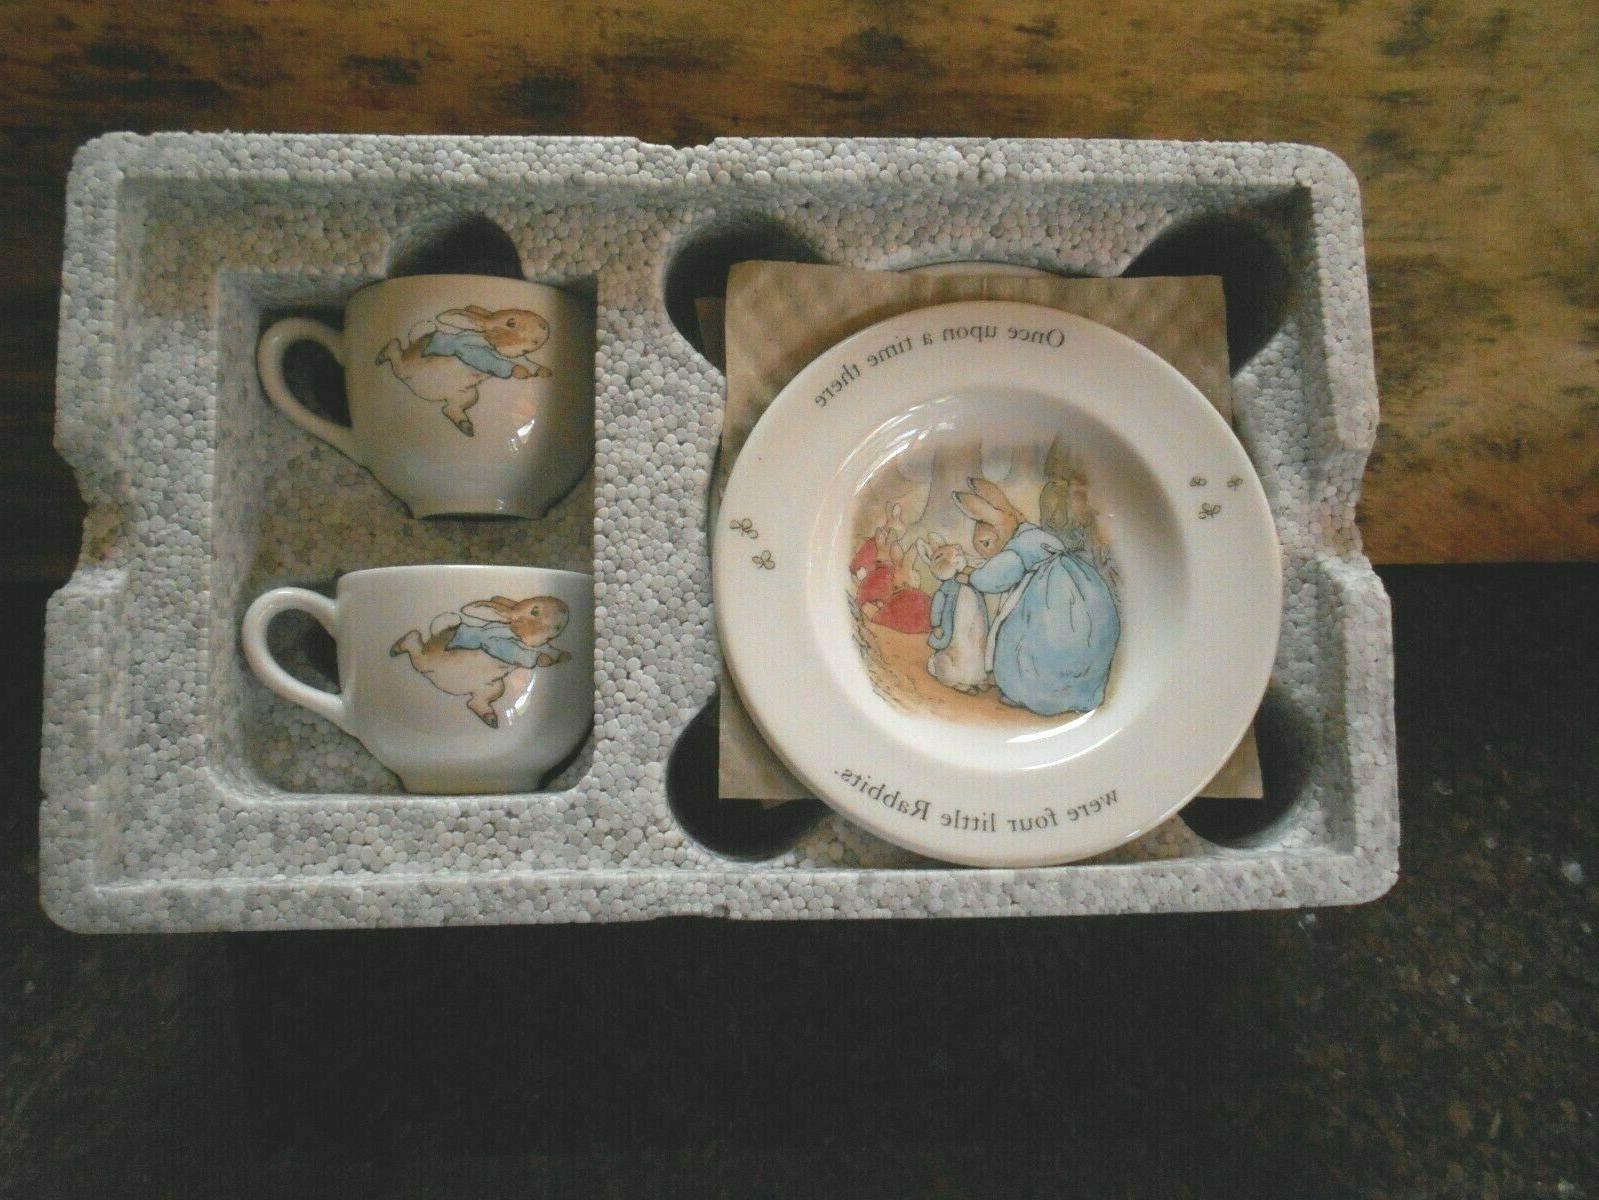 Peter Rabbit piece Tea Set Potter NIB!